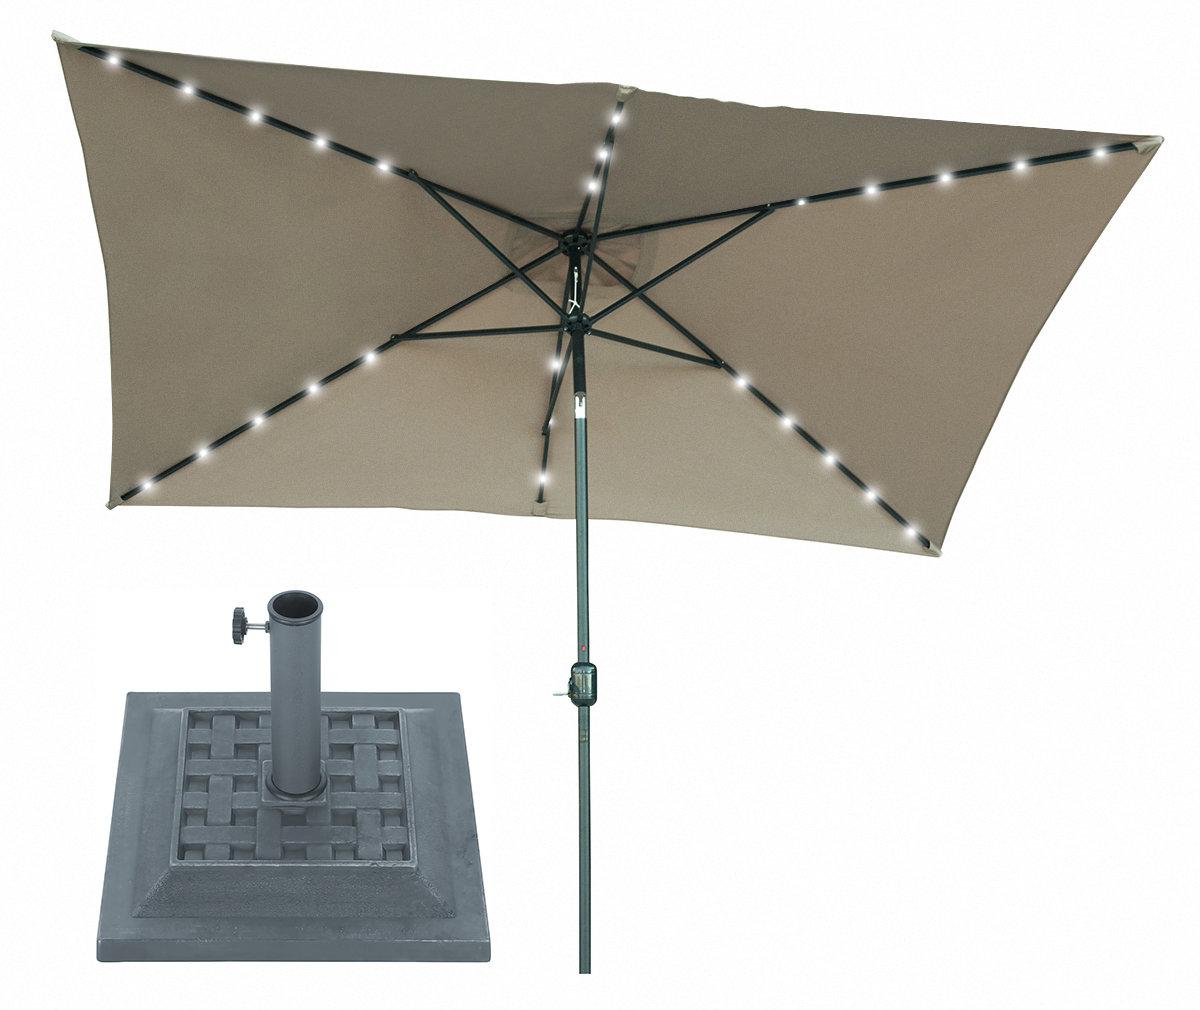 Bramblett 10' X 6.5' Rectangular Lighted Umbrella With Regard To Famous Pau Rectangular Market Umbrellas (Gallery 8 of 20)